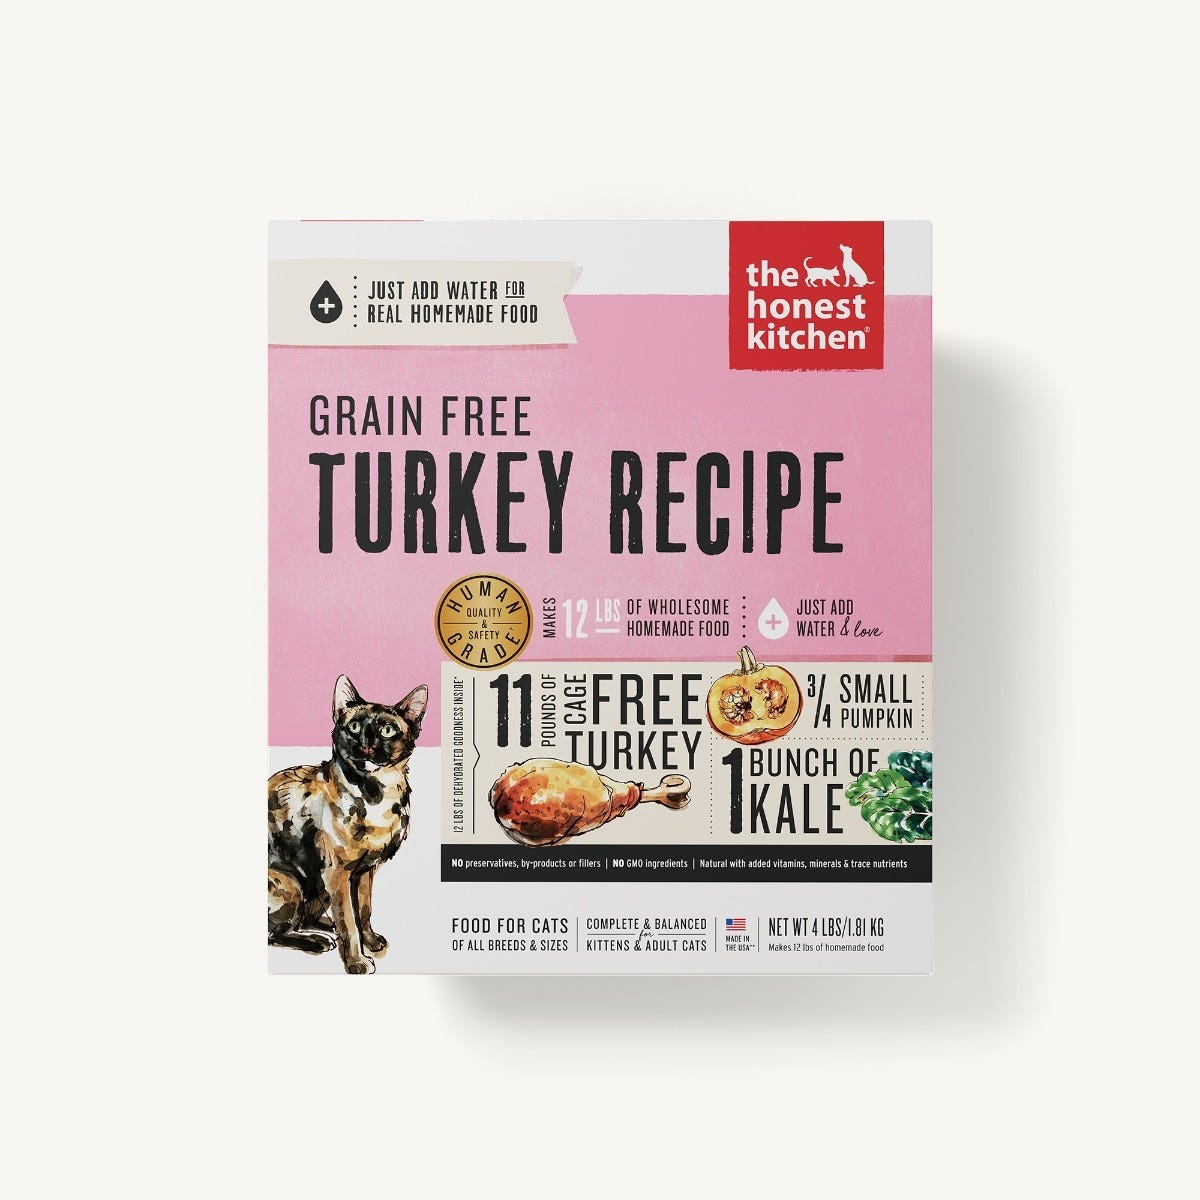 The Honest Kitchen The Honest Kitchen Grain Free Turkey Recipe Dehydrated Cat Food